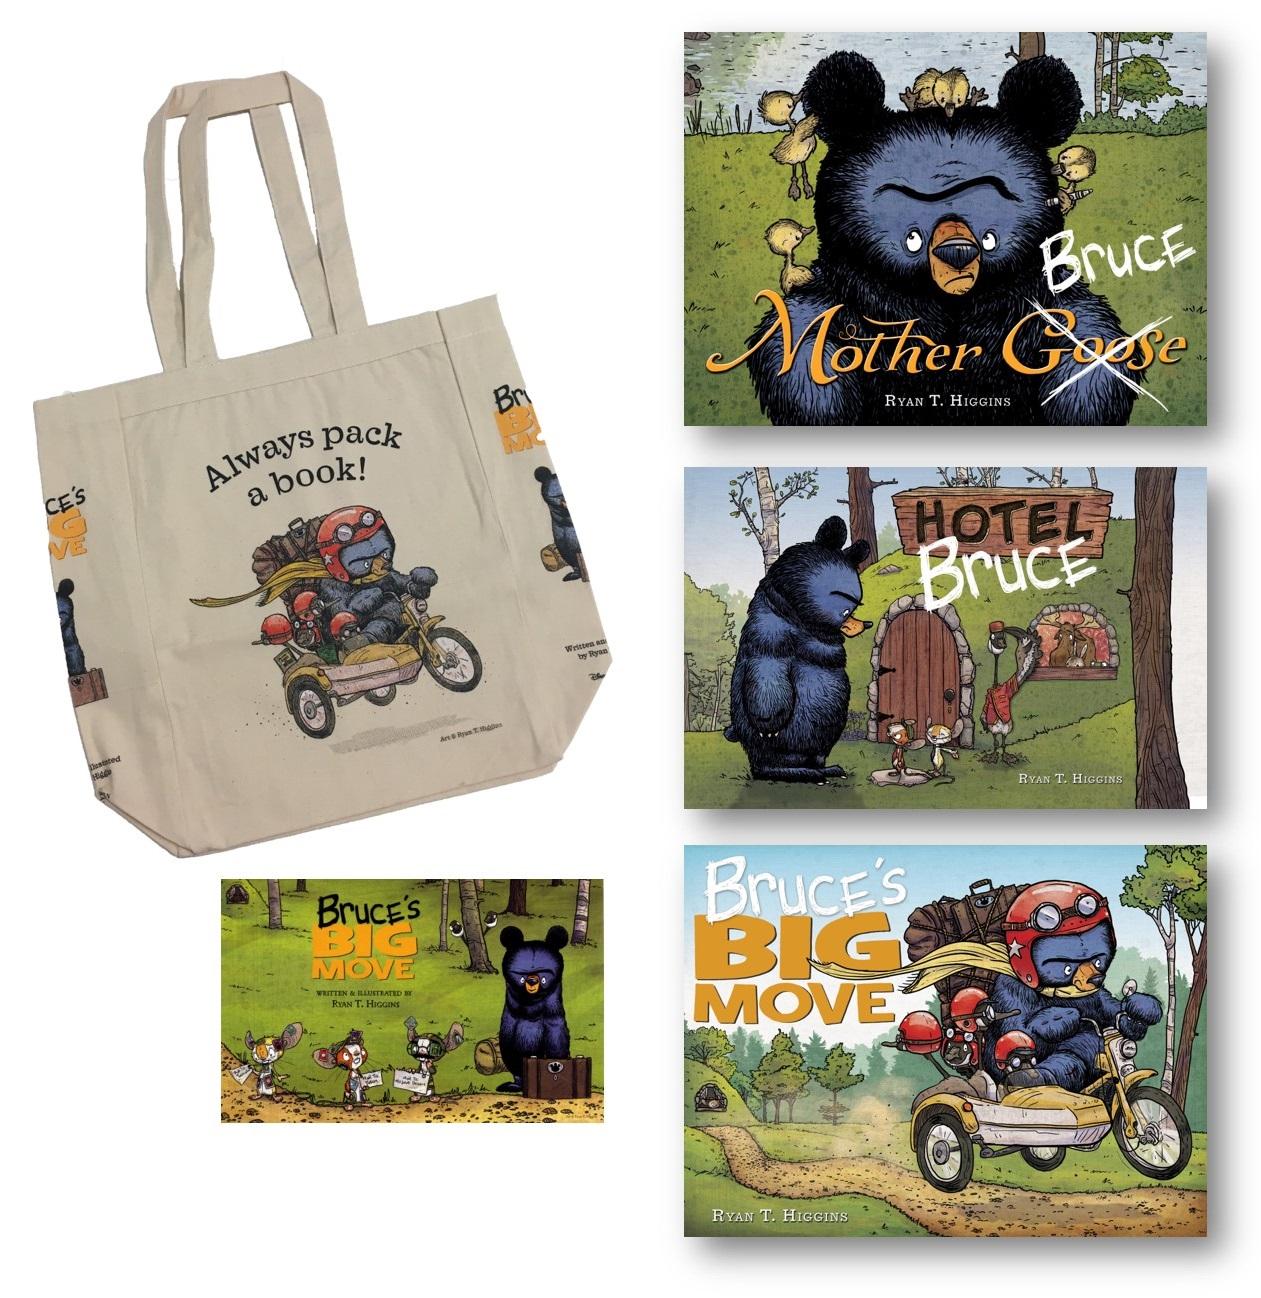 celebrate-picture-books-picture-book-review-Bruce-WholeLottaBrucePrize